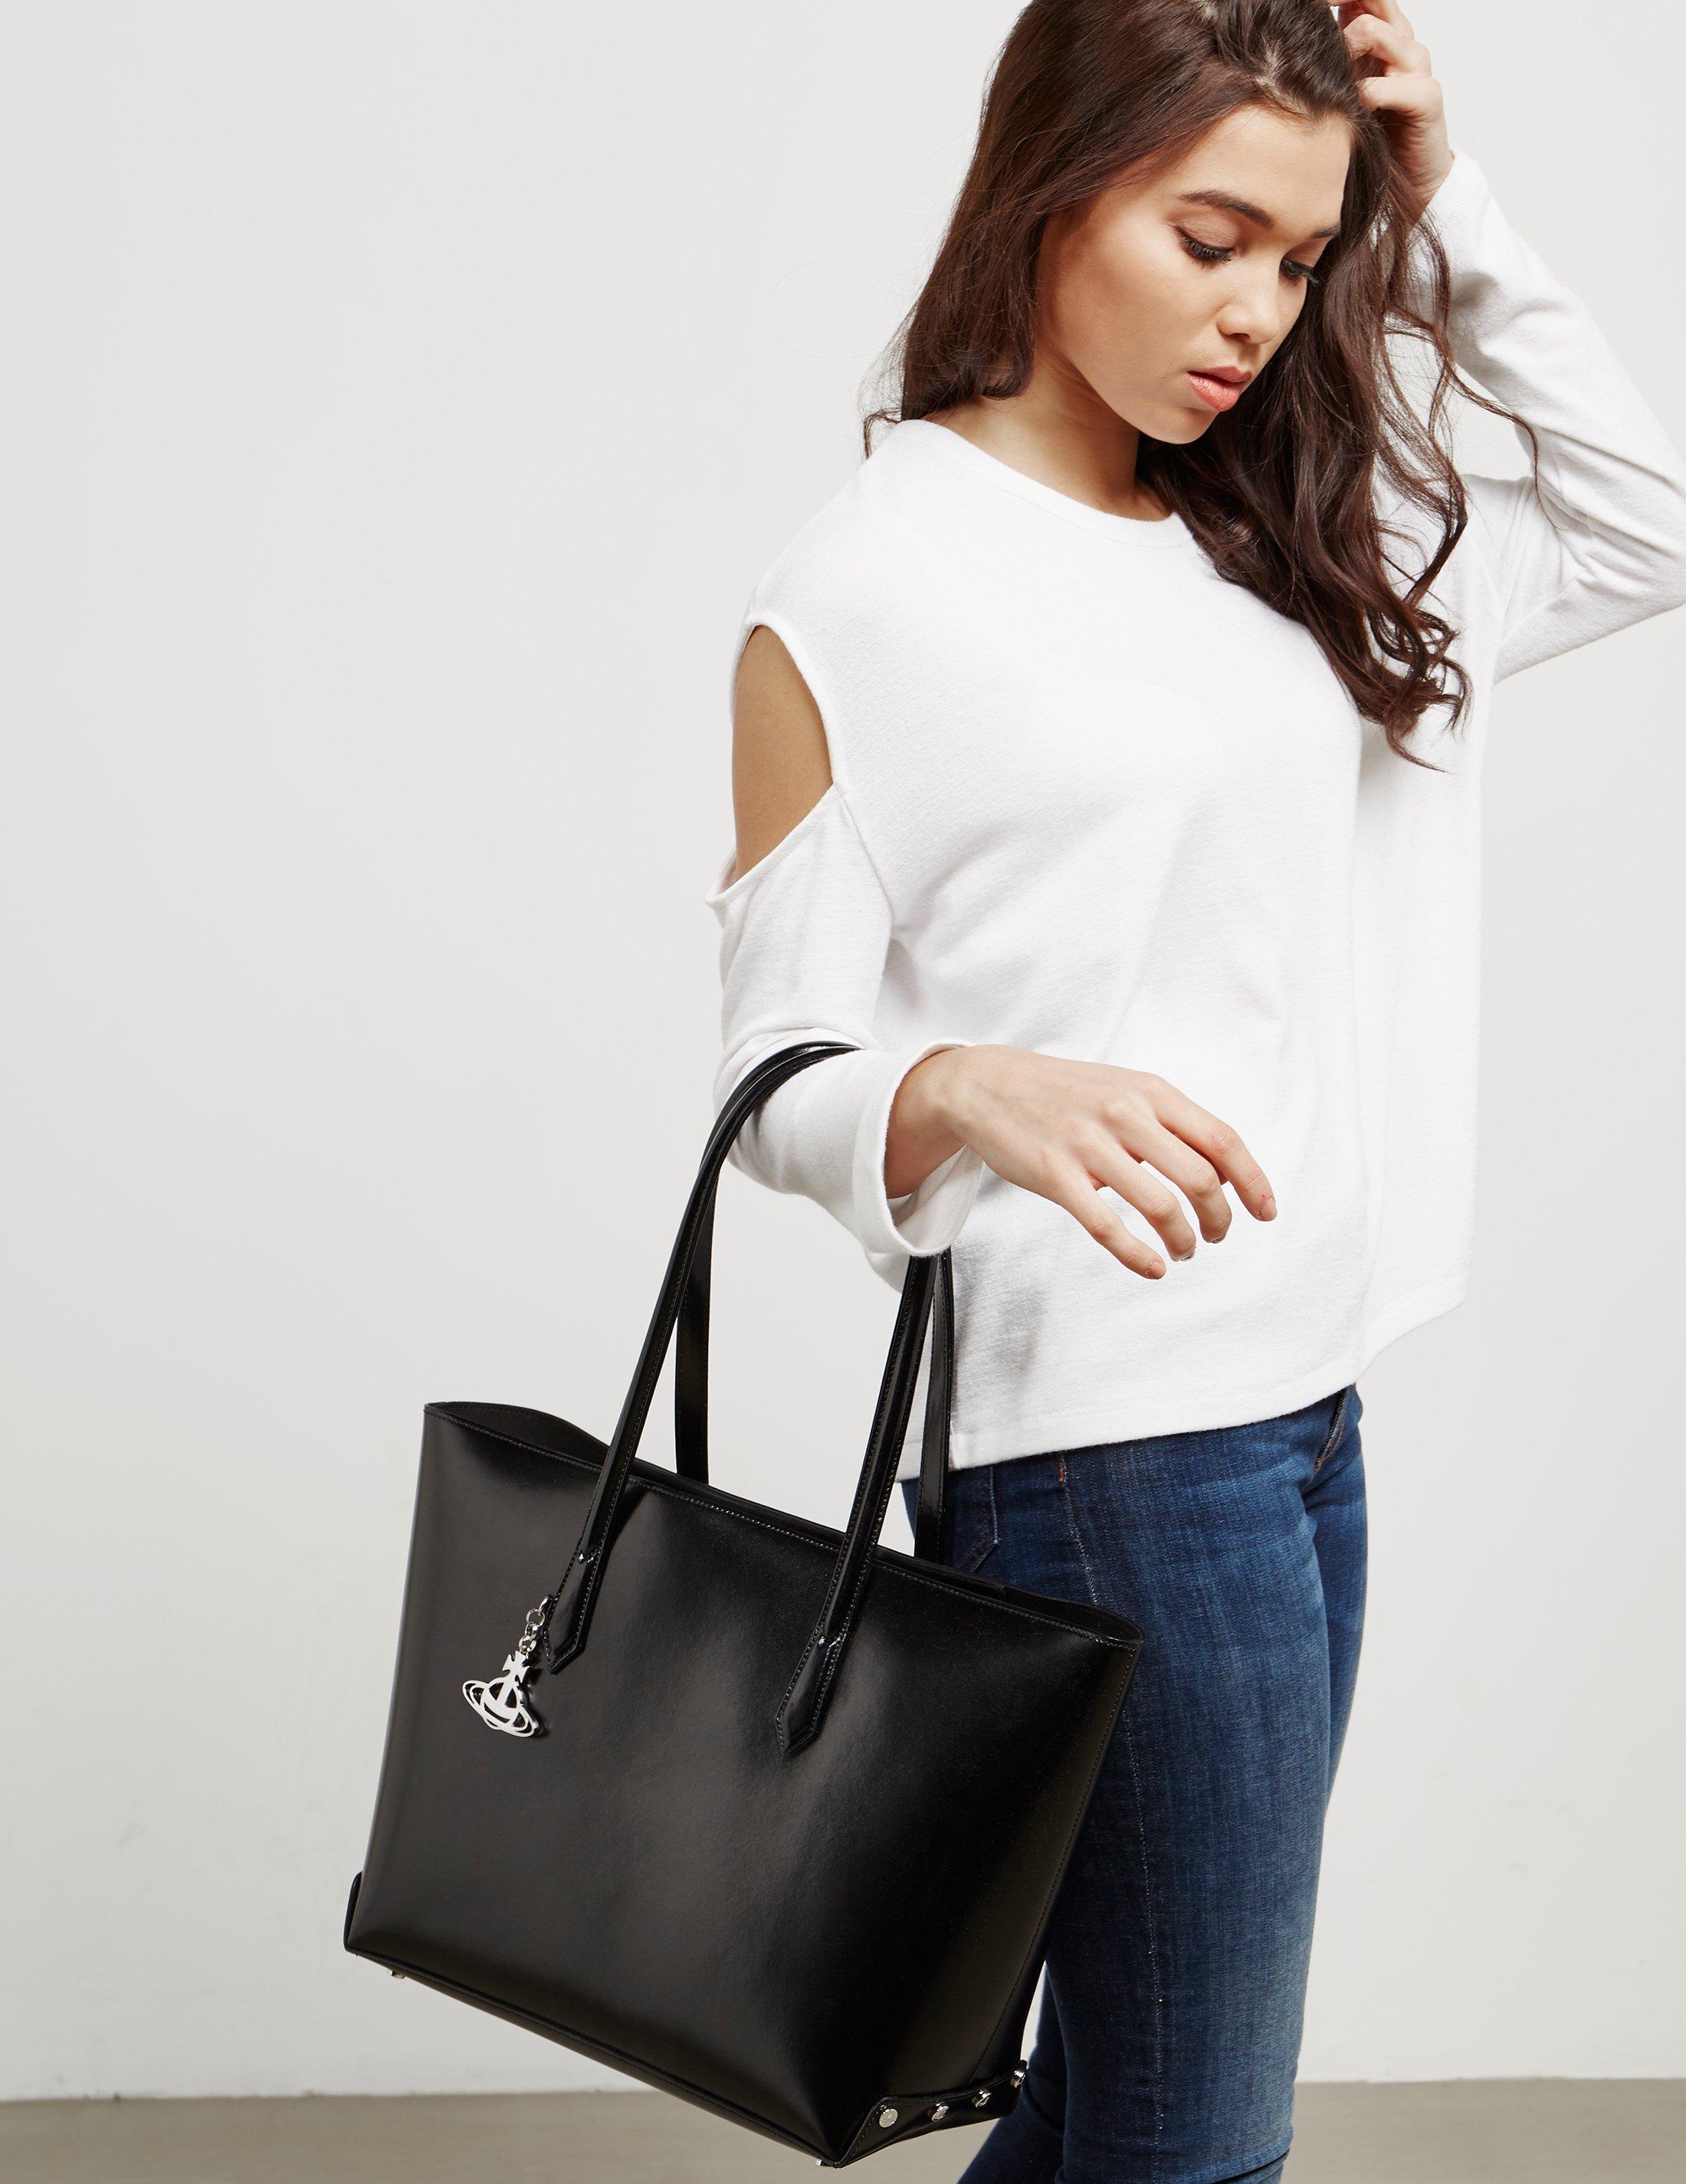 Vivienne Westwood Womens Sarah Large Shopper Bag Black In Lyst Tote Mc